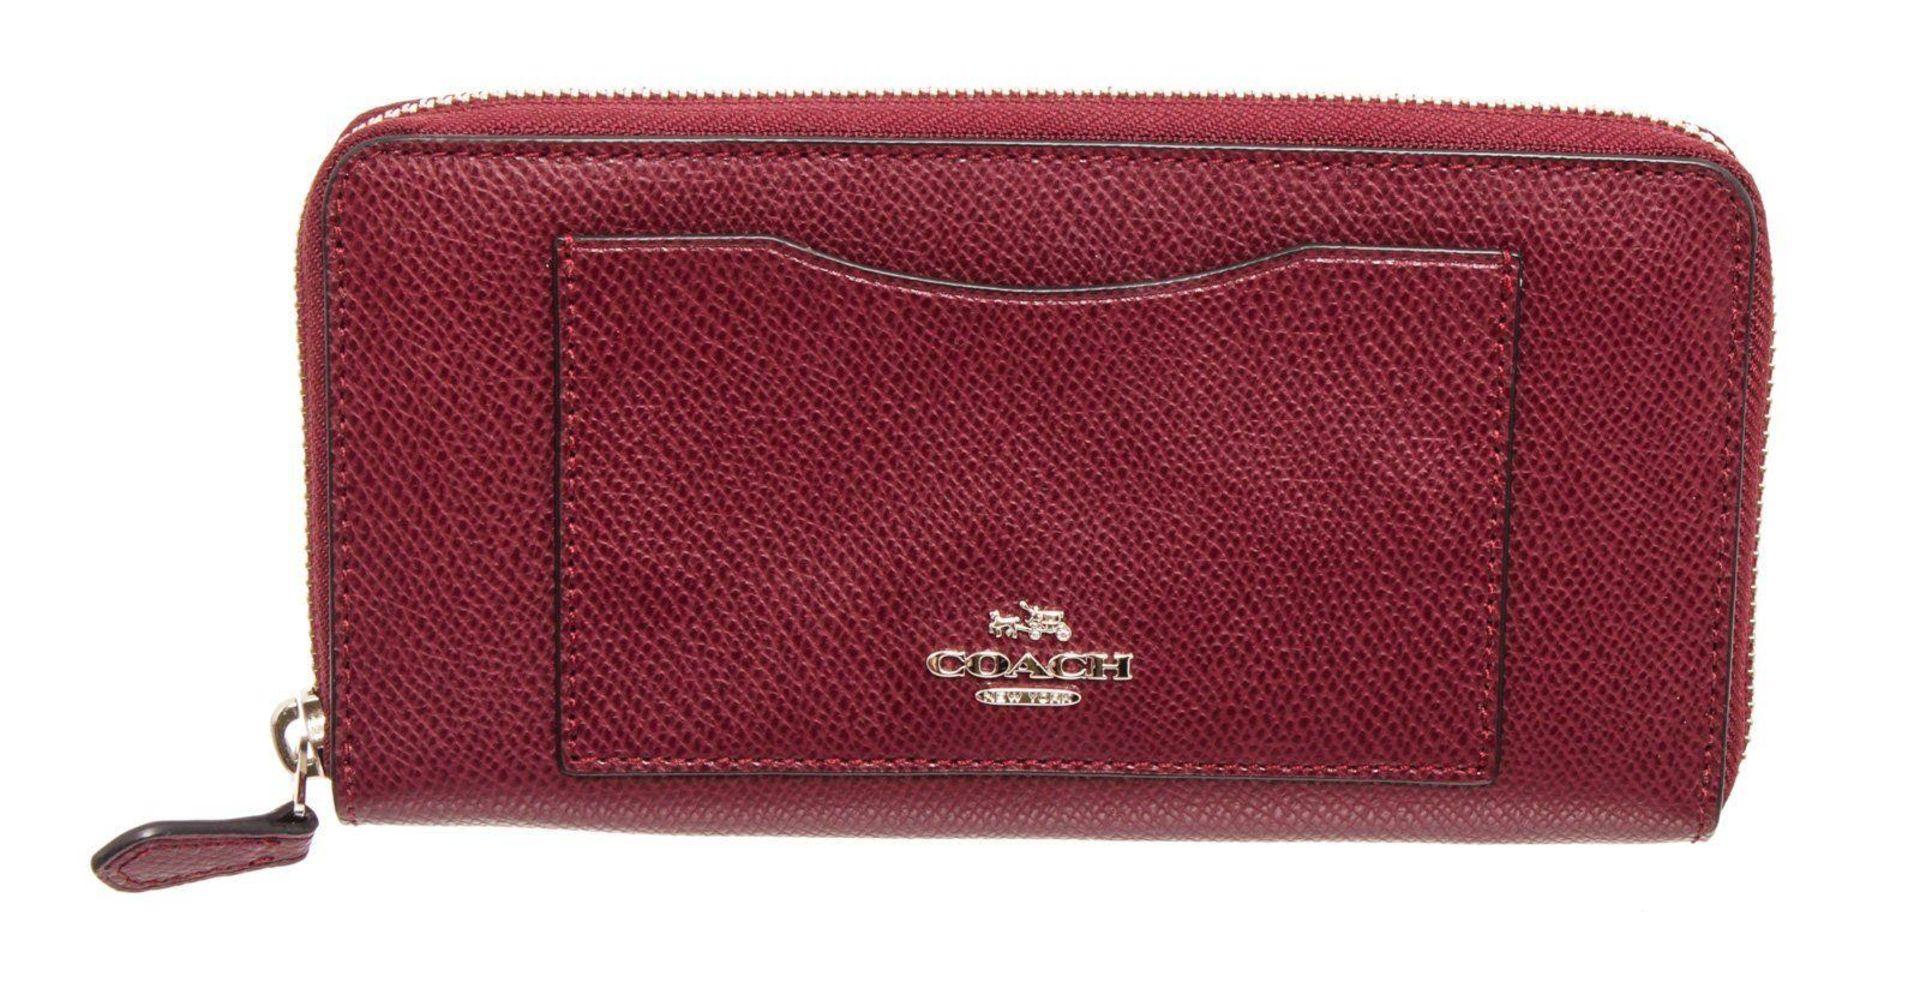 Coach Burgundy Leather Long Zippy Wallet